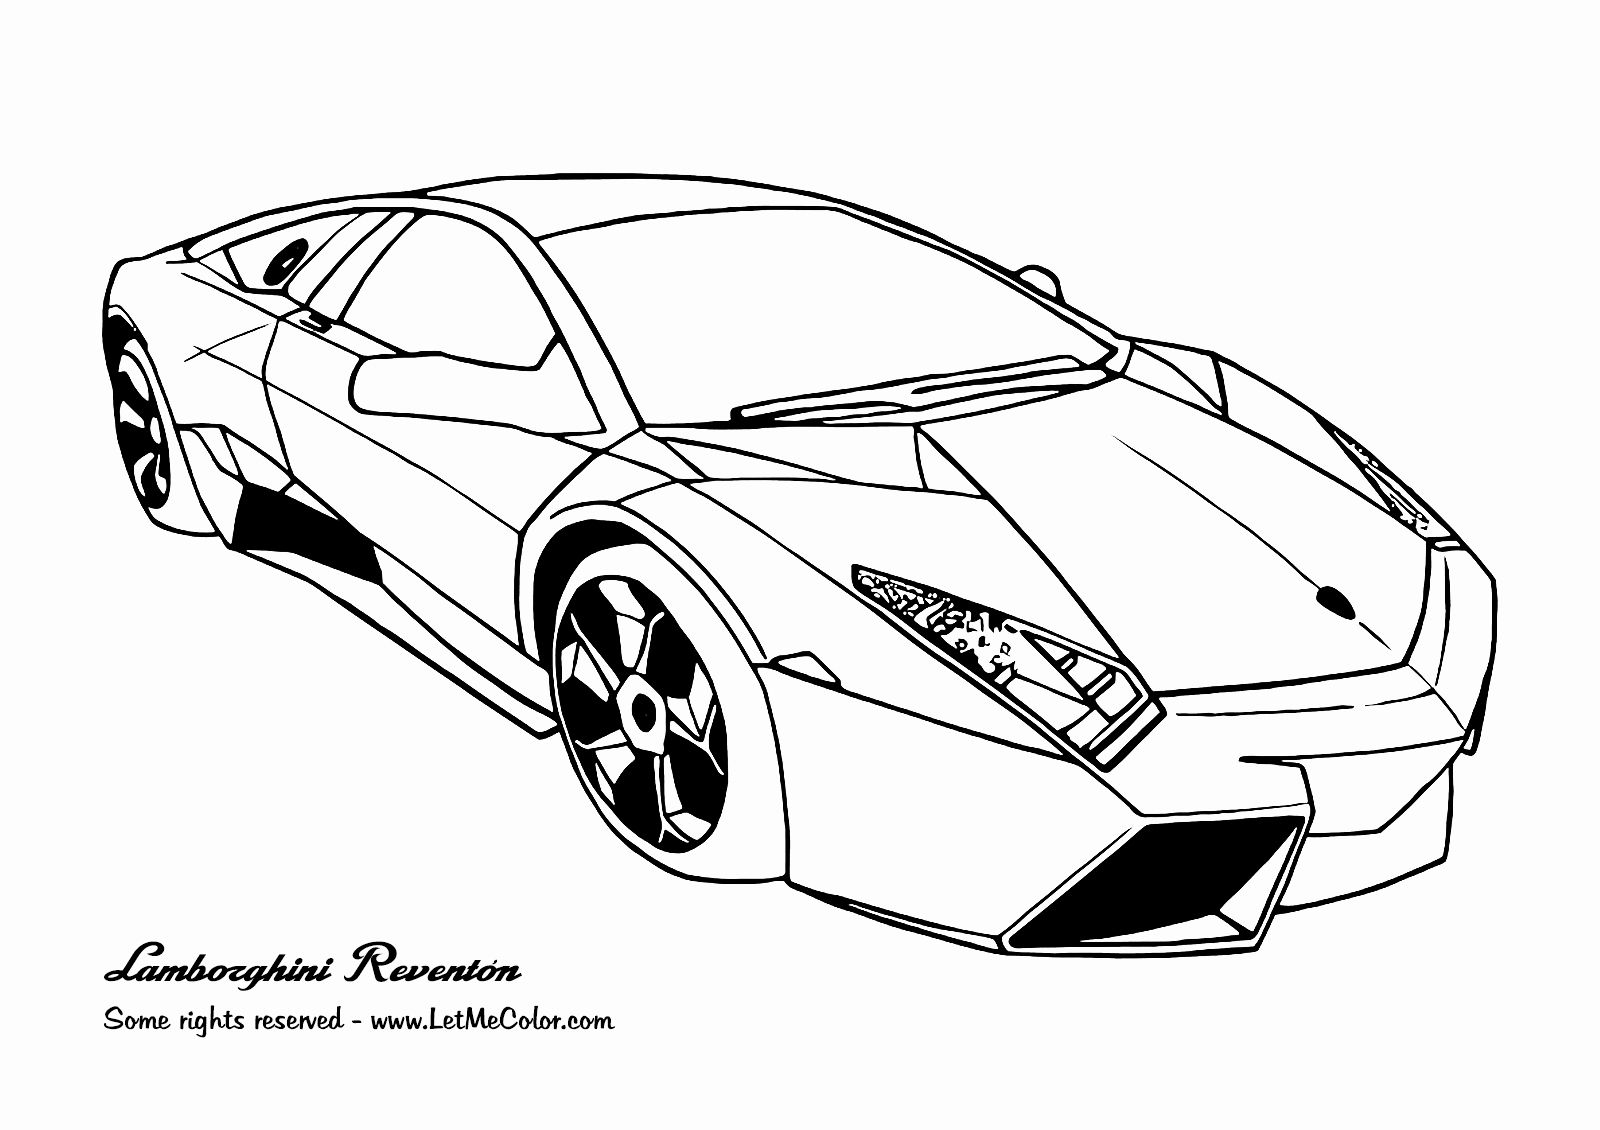 Cool Car Coloring Pages Inspirational Lamborghini Reventon